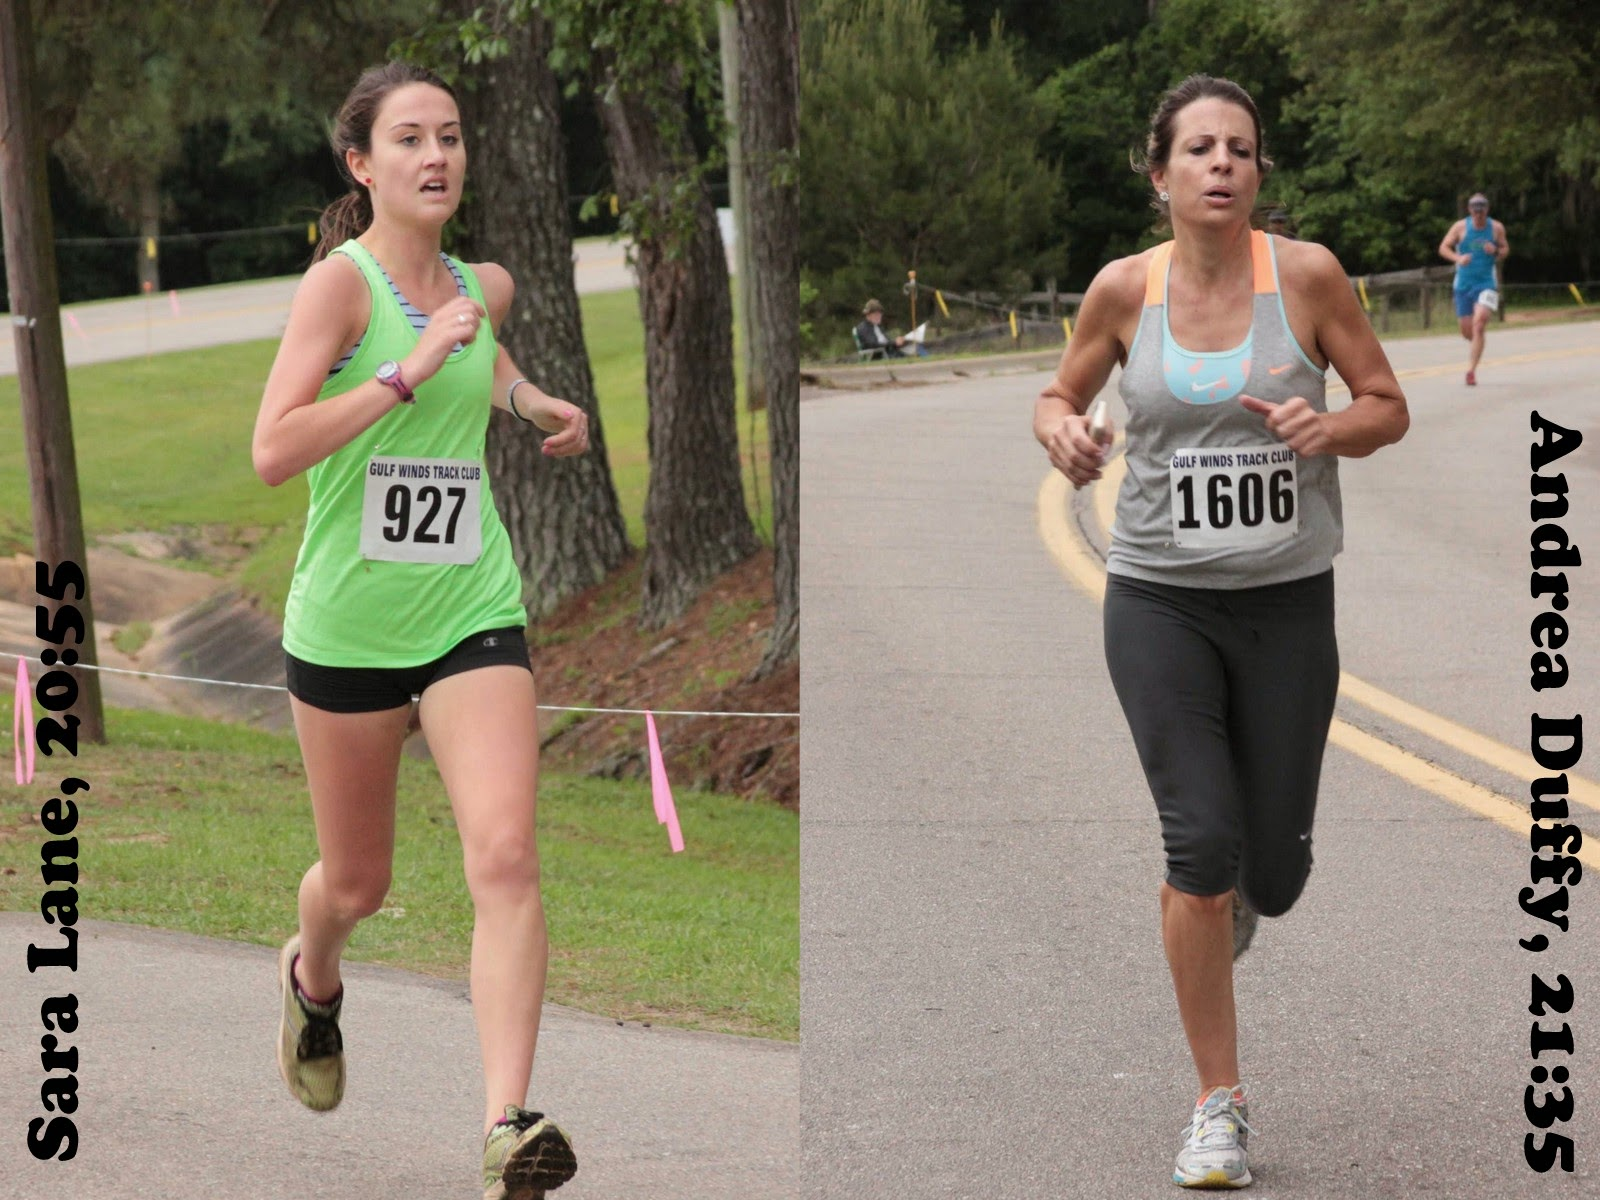 Sara Lane and Andrea Duffy